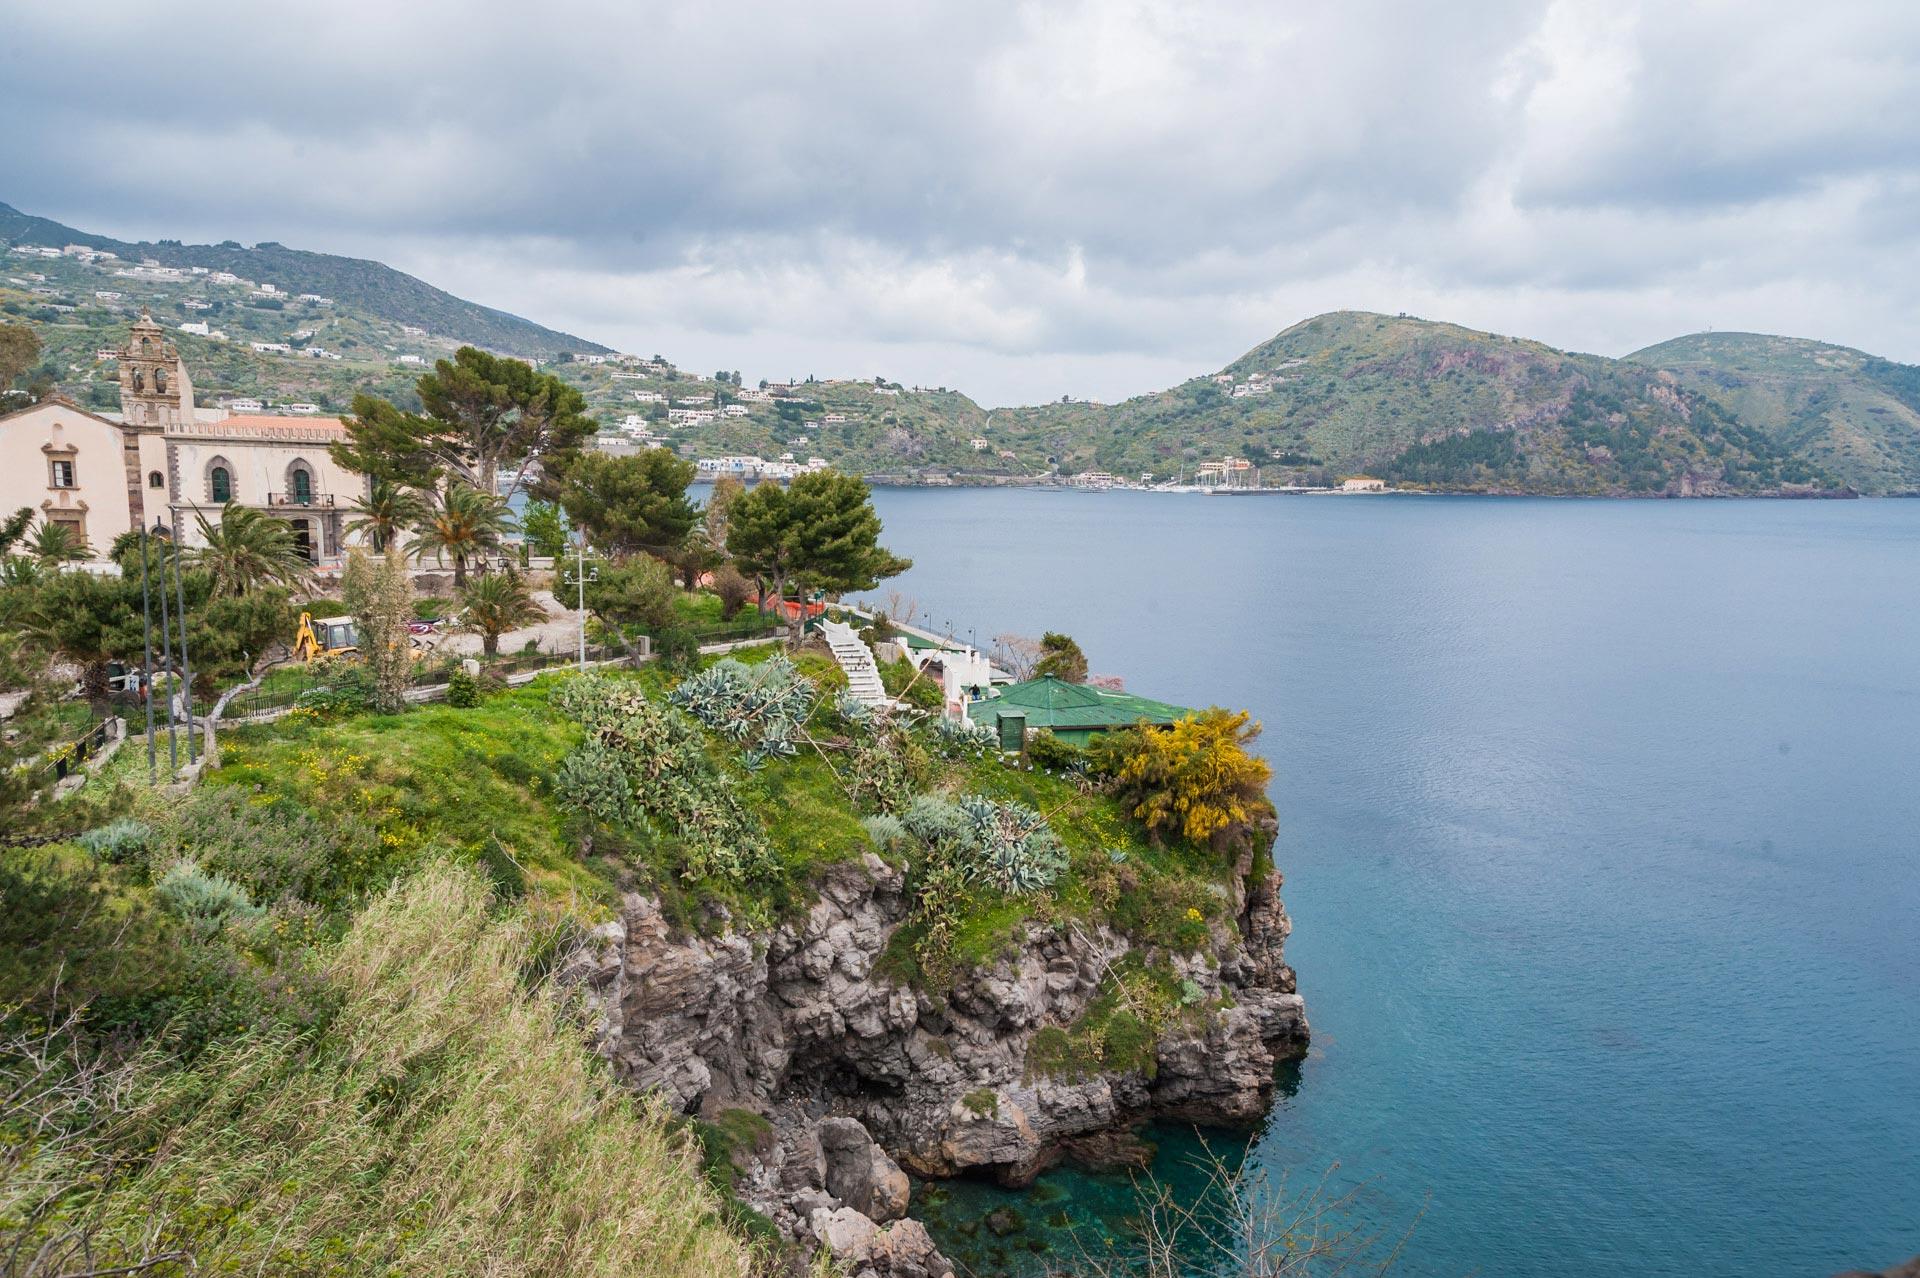 Die Insel Lipari